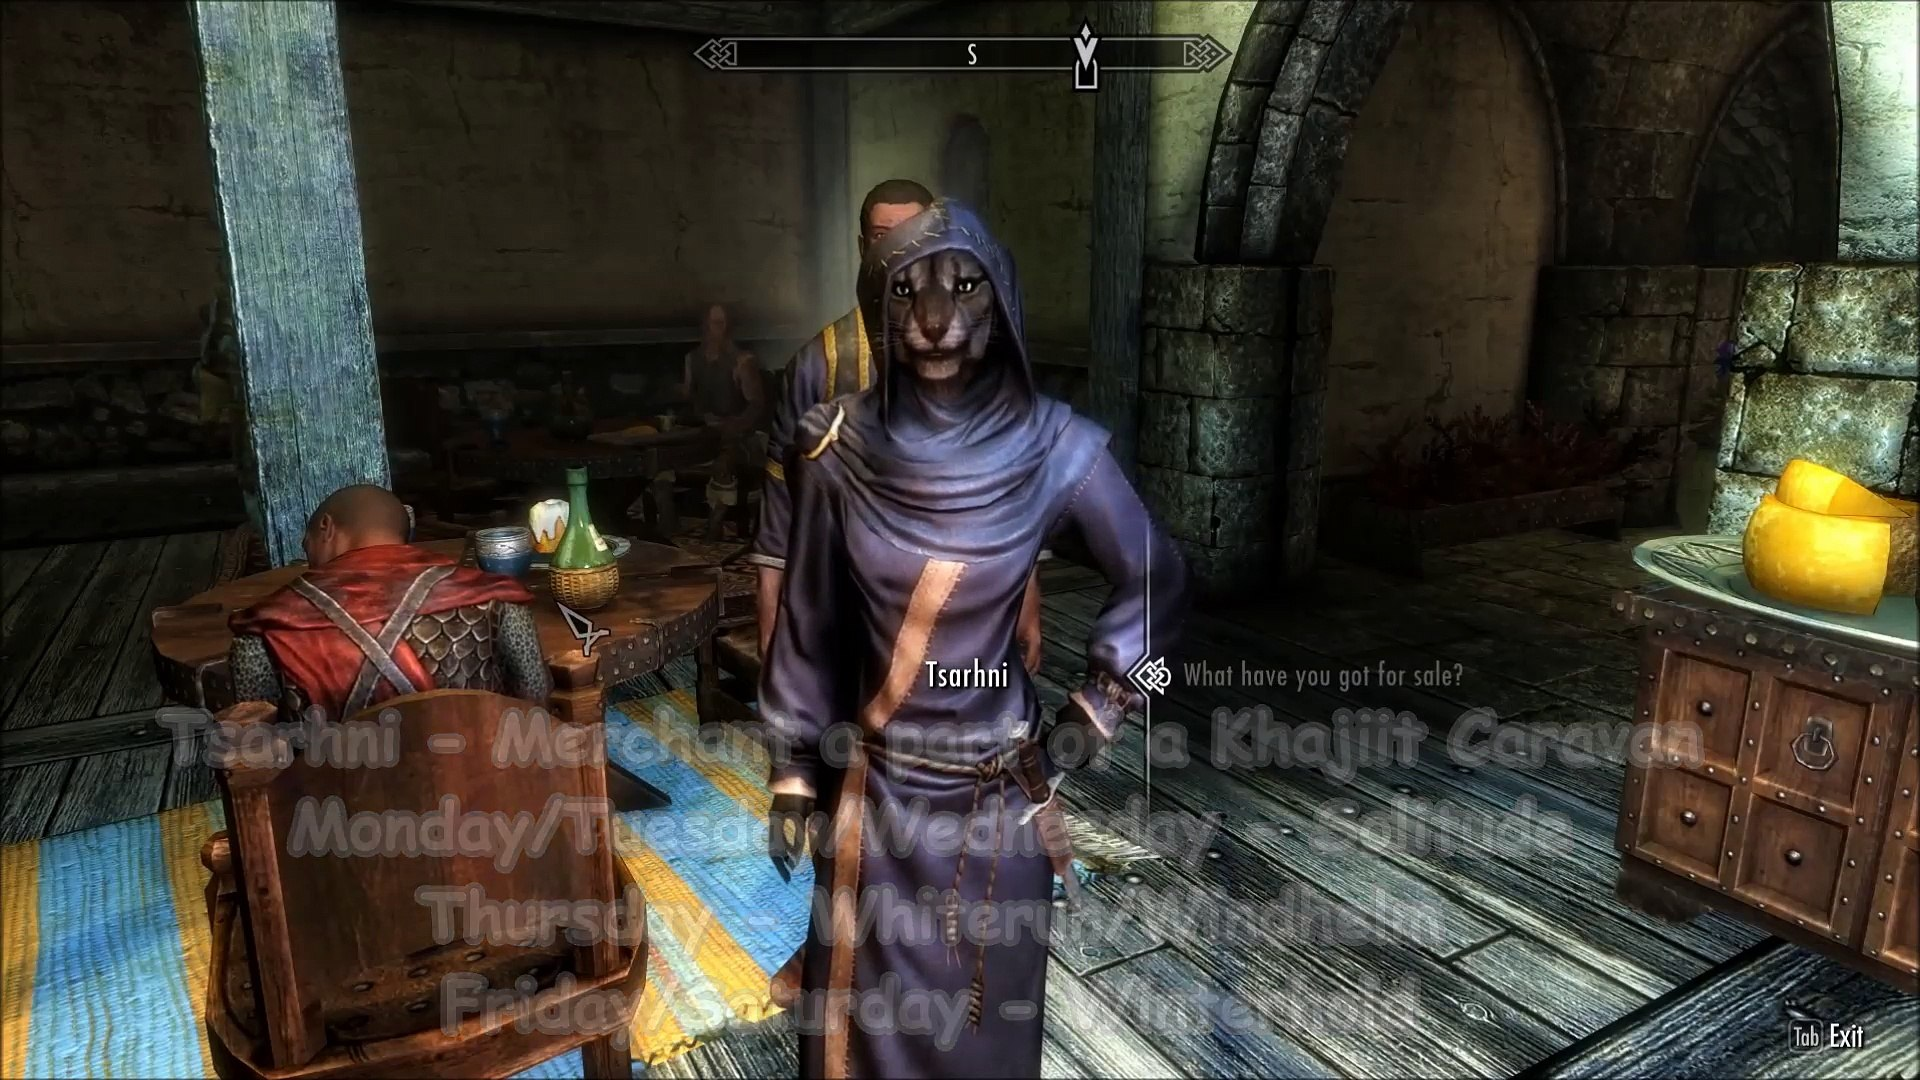 Skyrim Special Edition: Dominion's More Khajiit - PS4 Xbox1 PC Release  Trailer